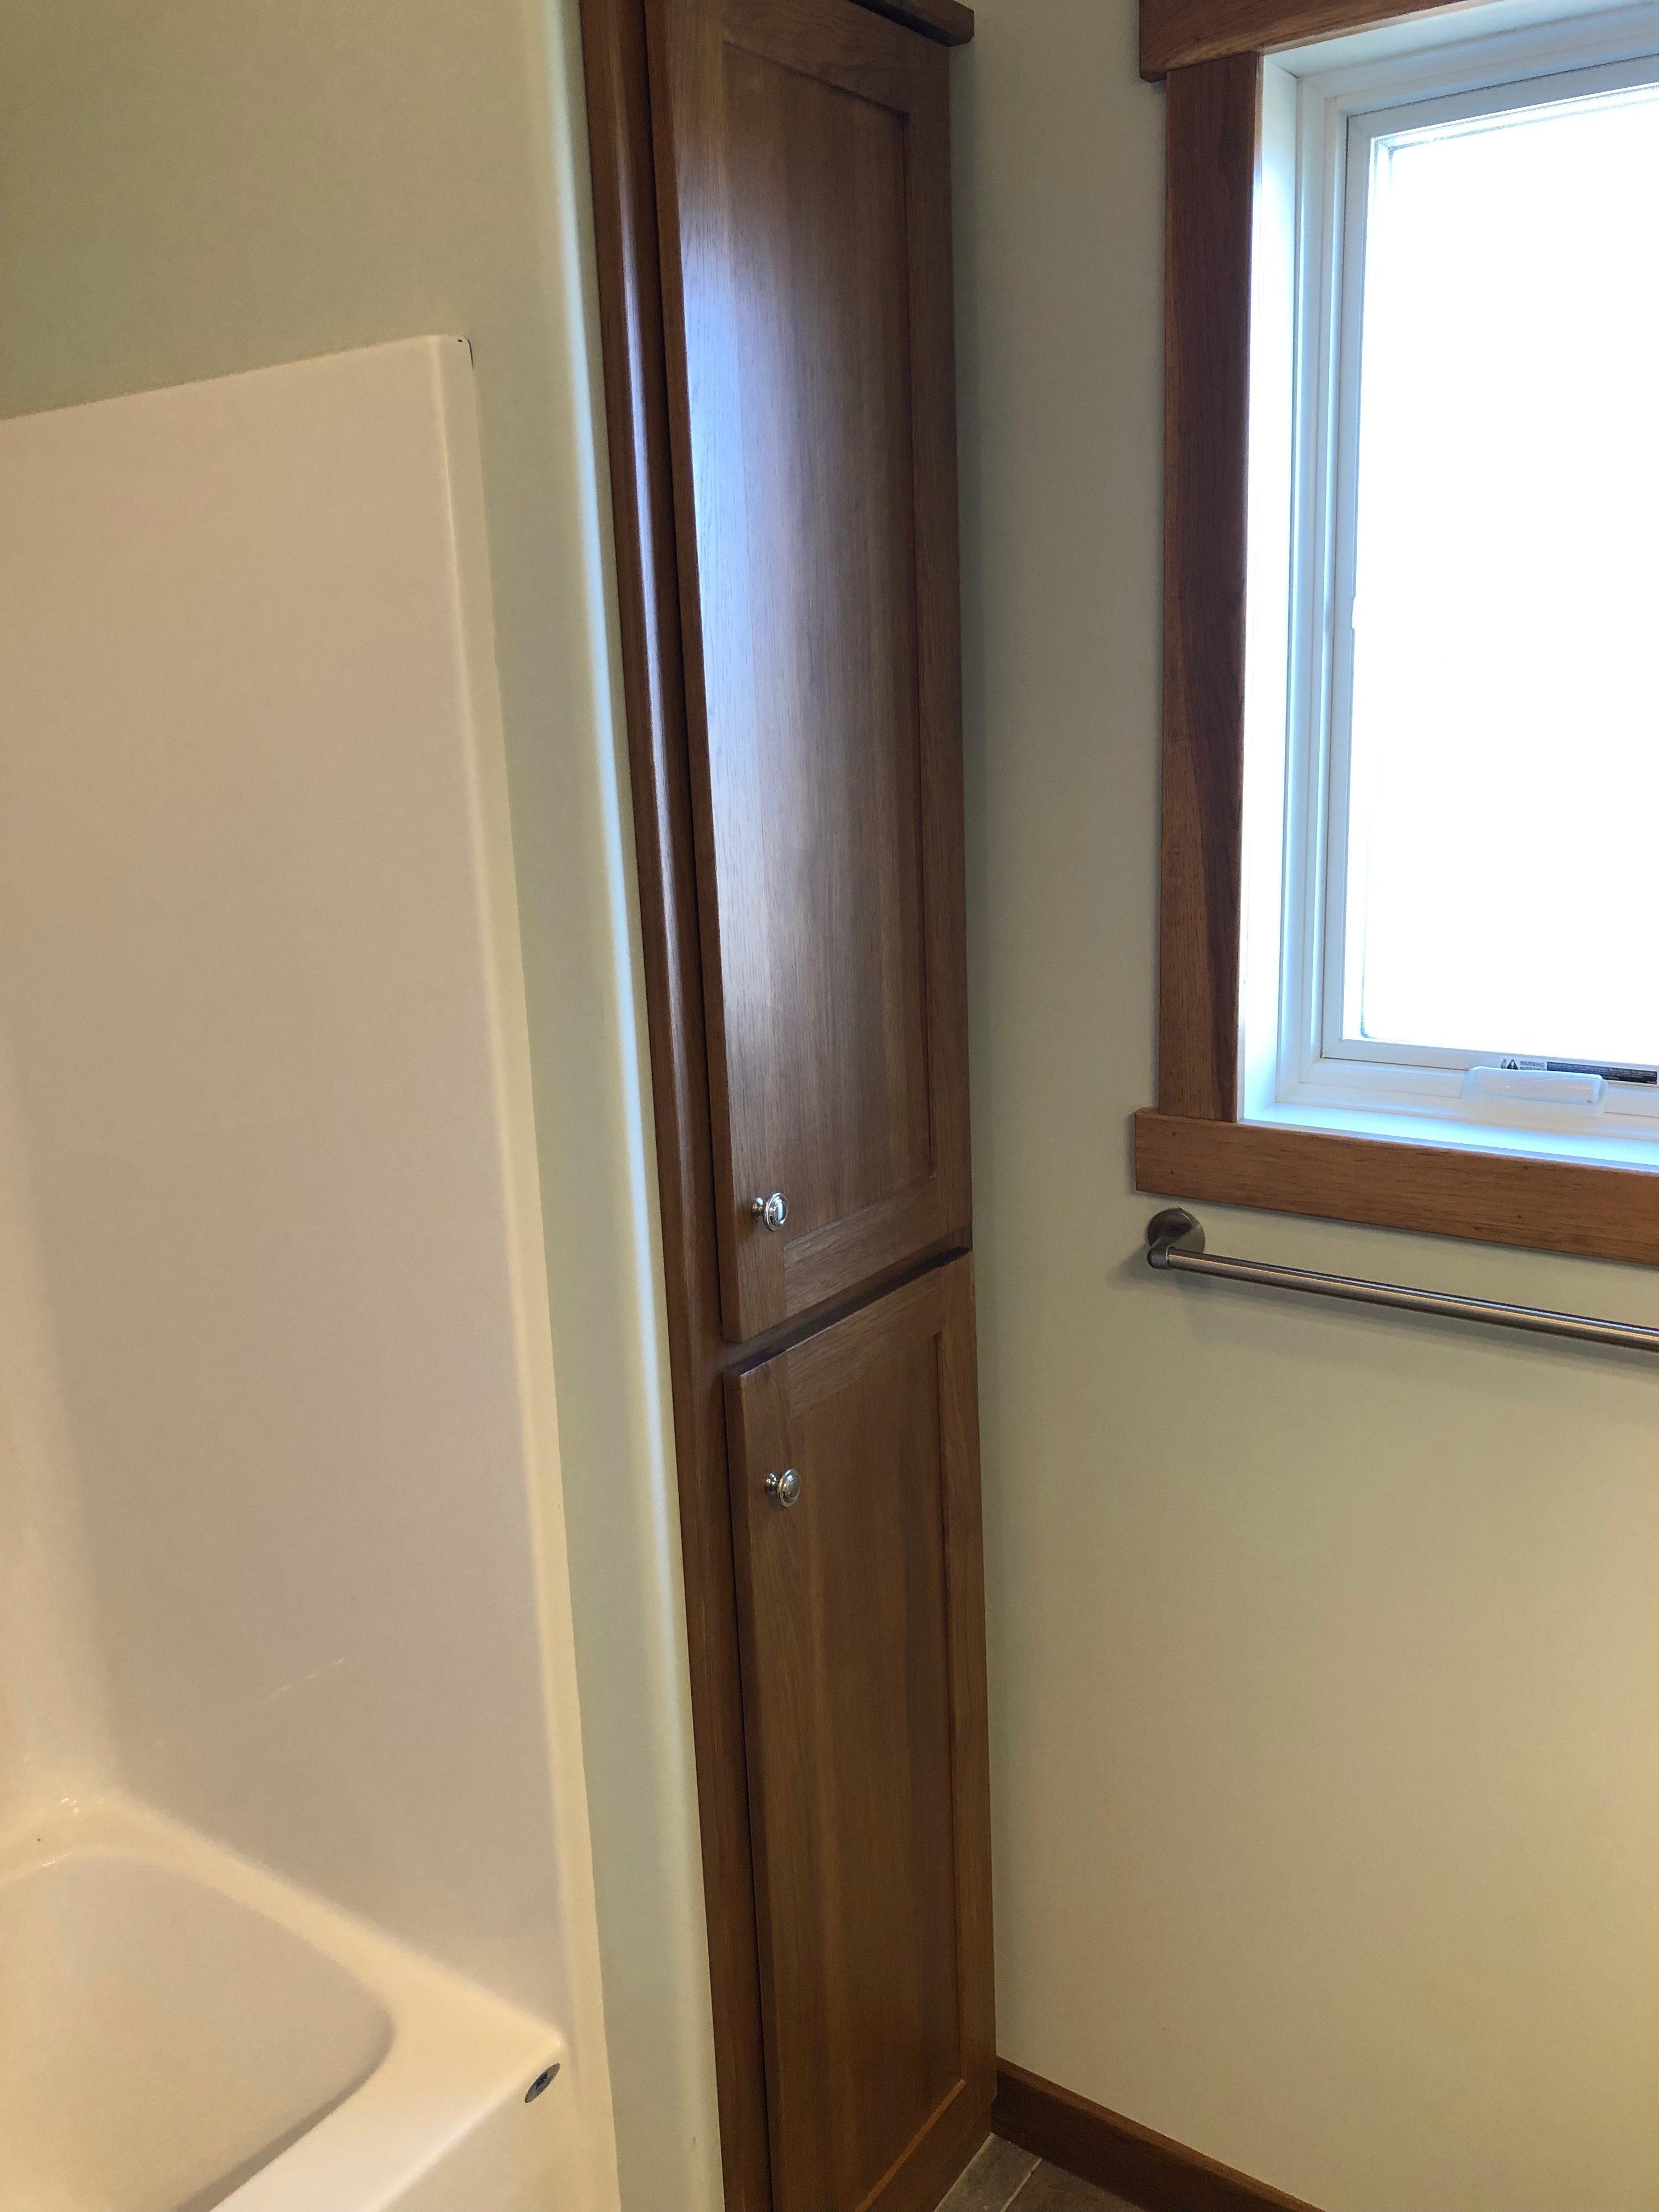 Hickory Bathroom Linen